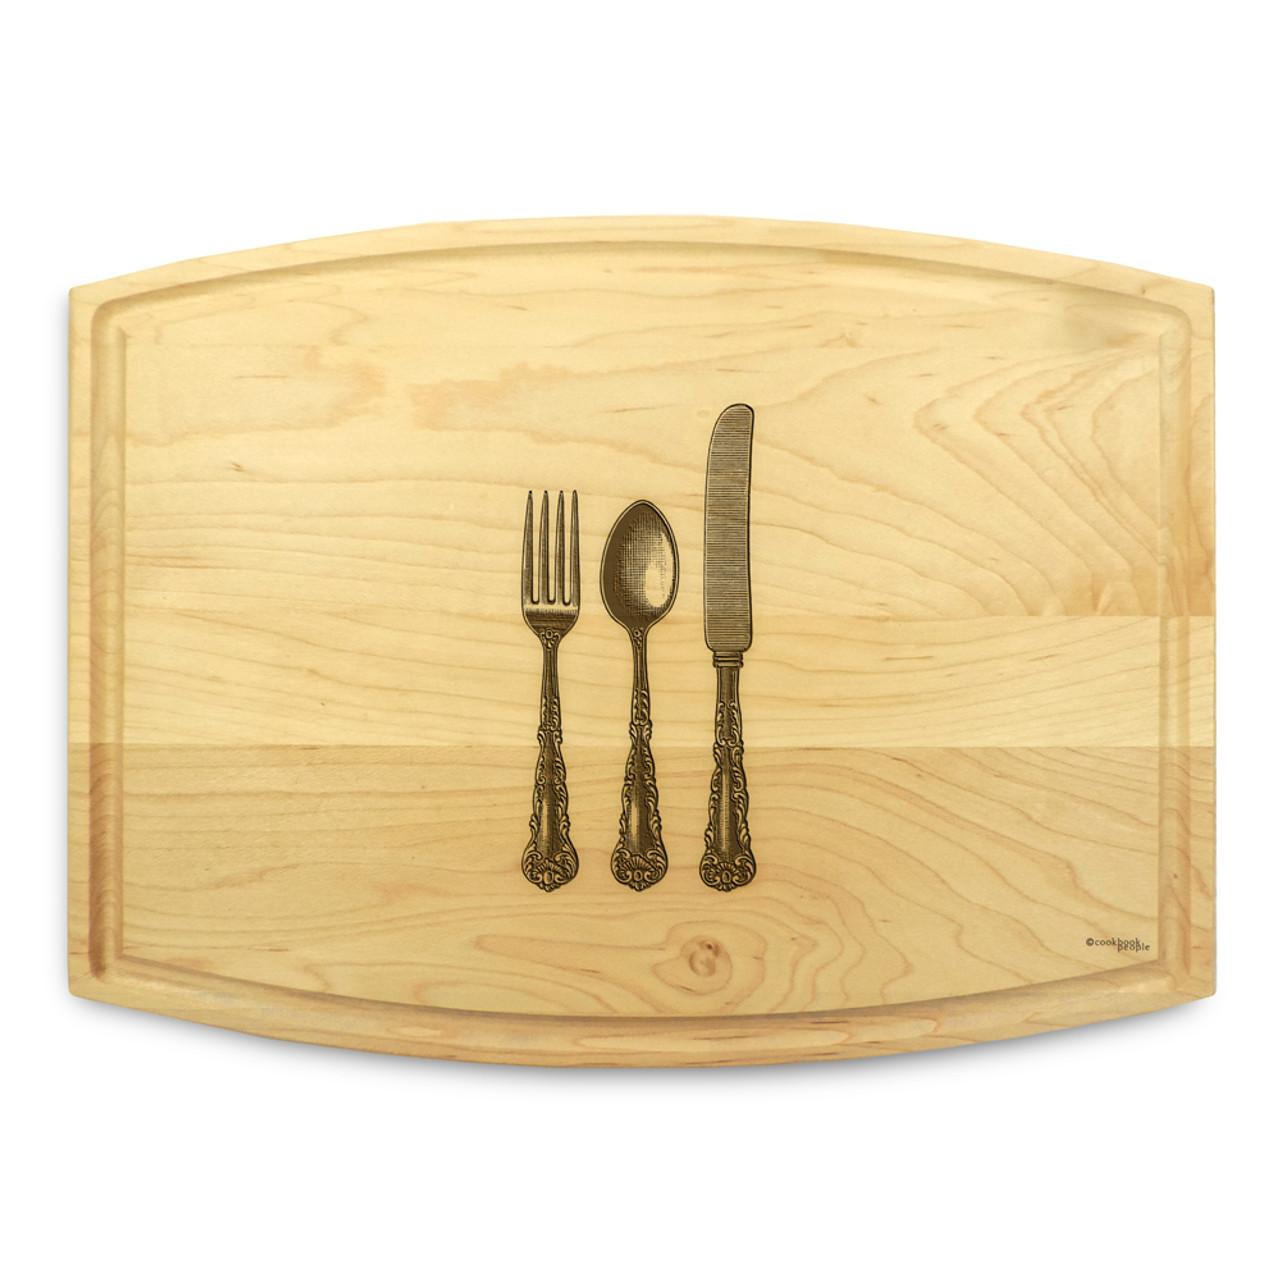 Rectangular cutting board in knifeforkspoon design